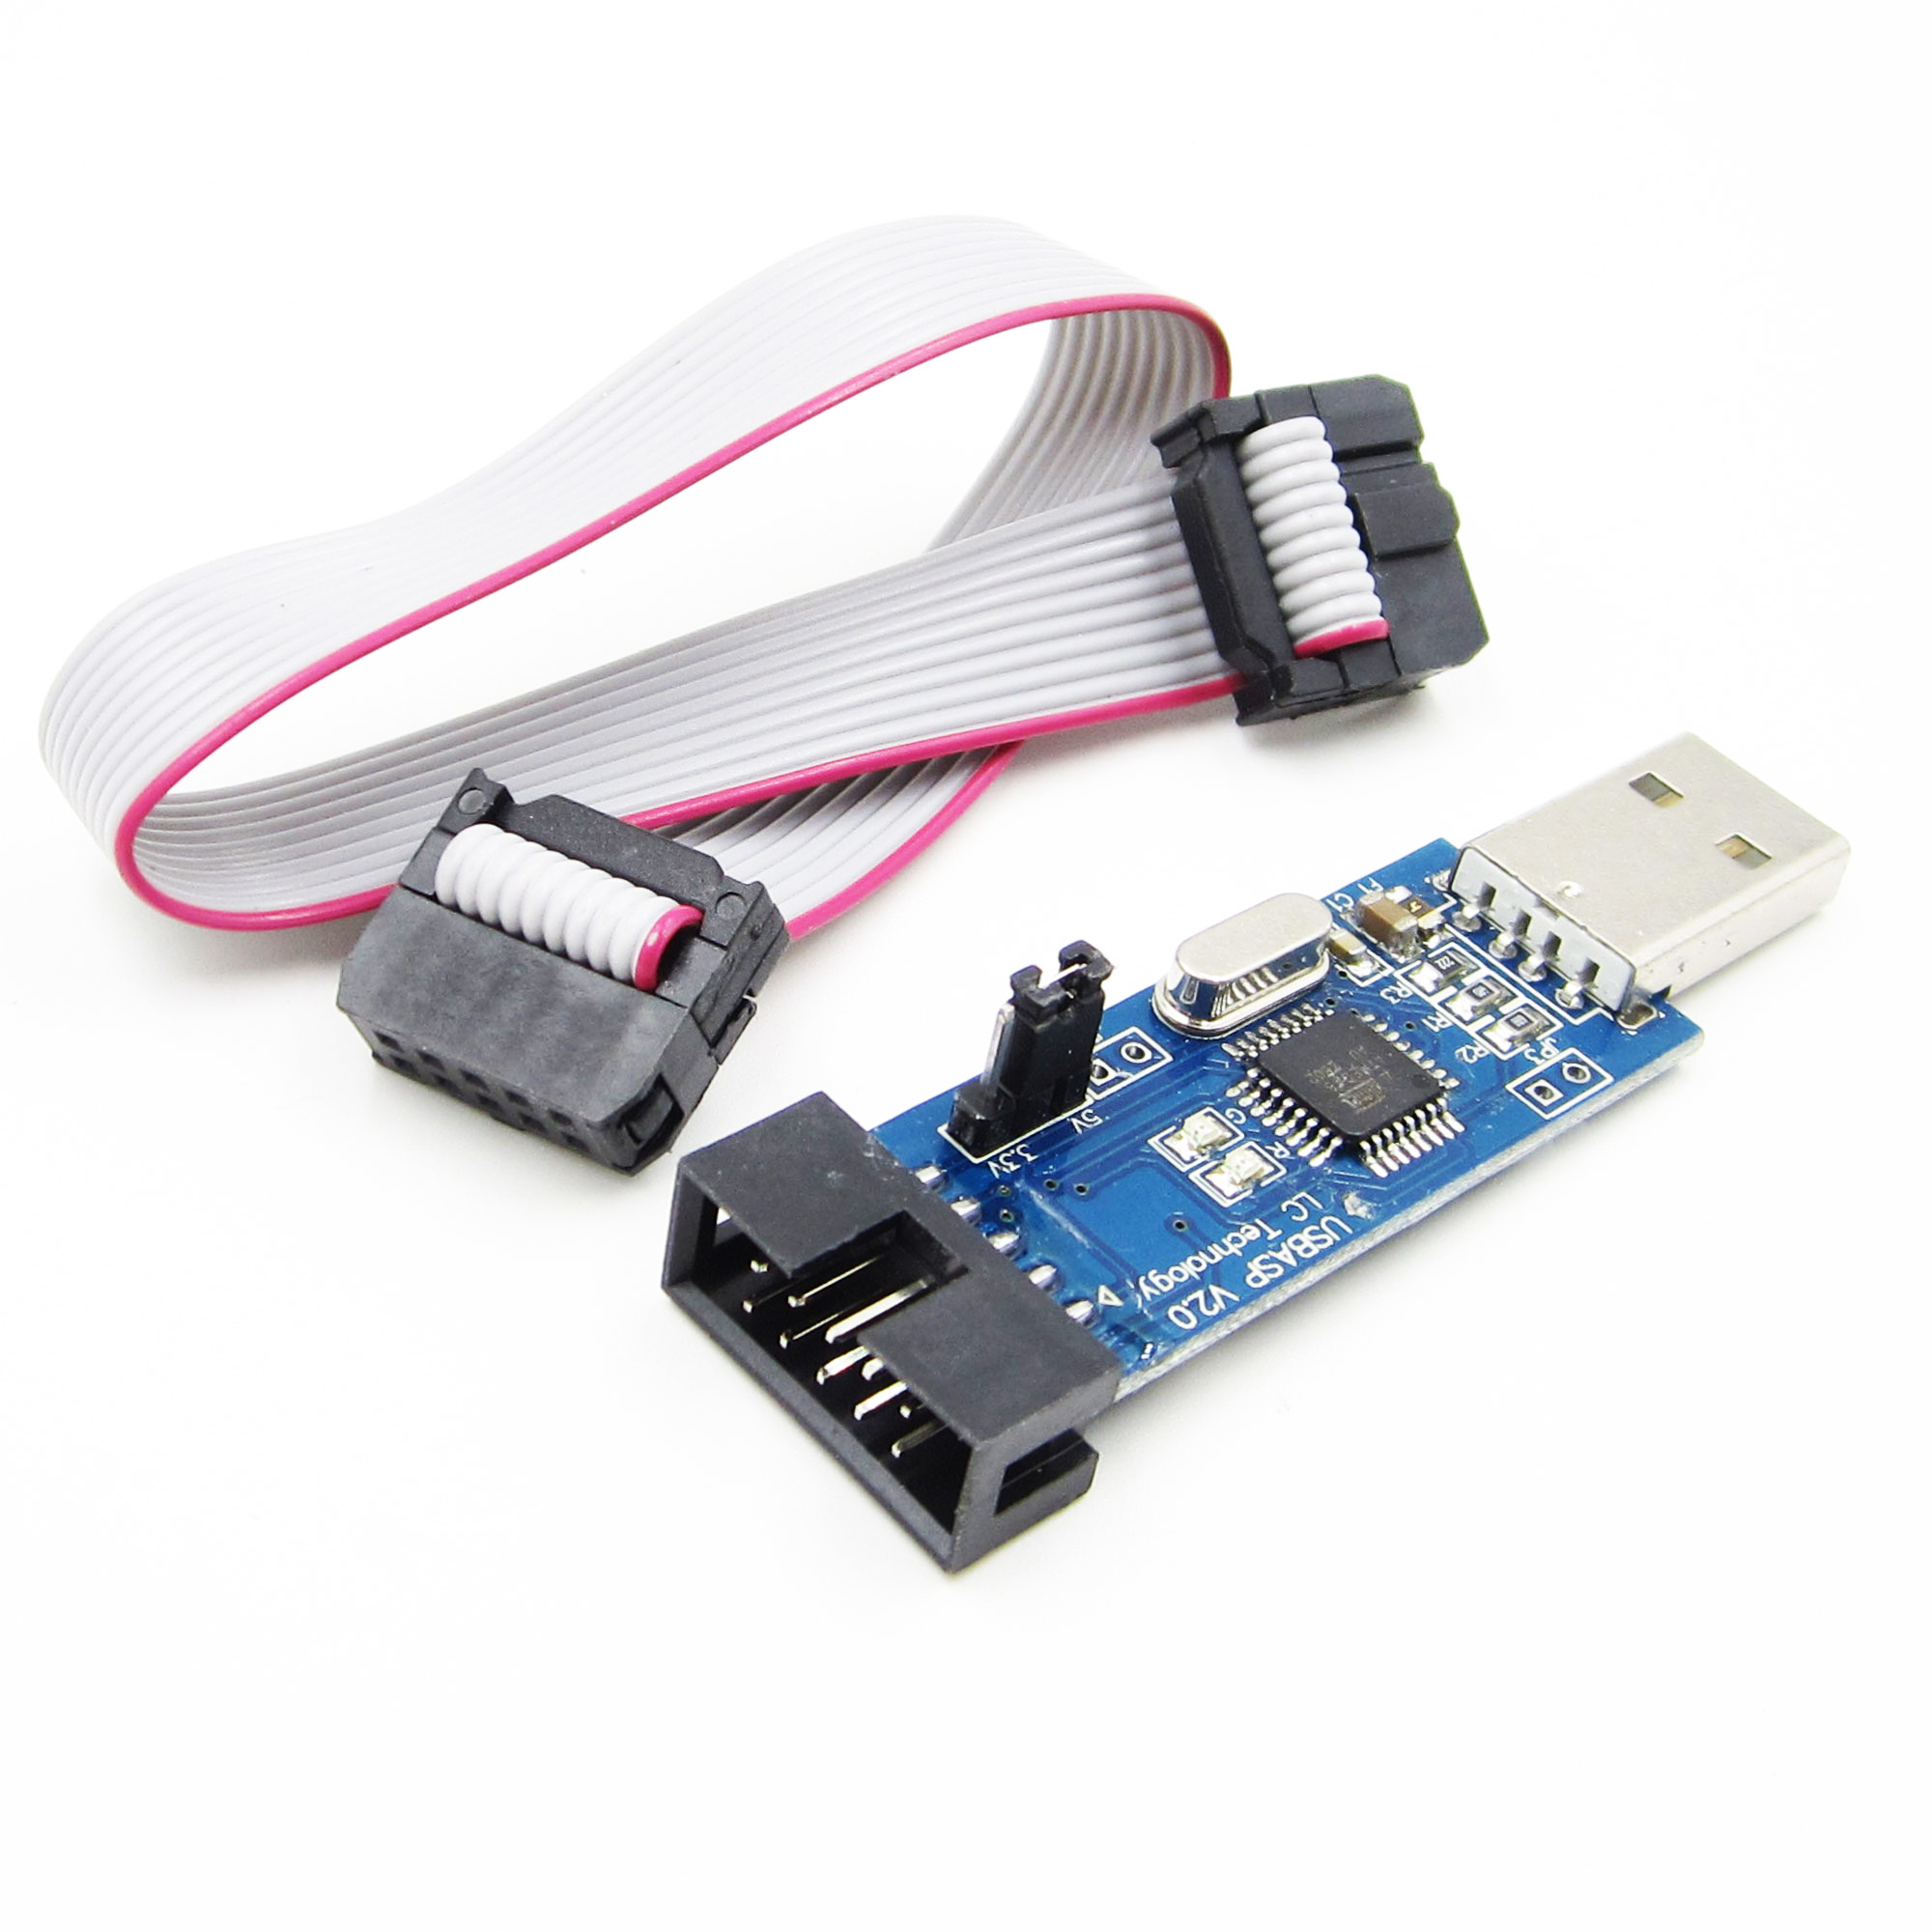 USBASP USBISP AVR Программист Адаптер 10 Контактный Кабель USB ATMEGA8 ATMEGA128